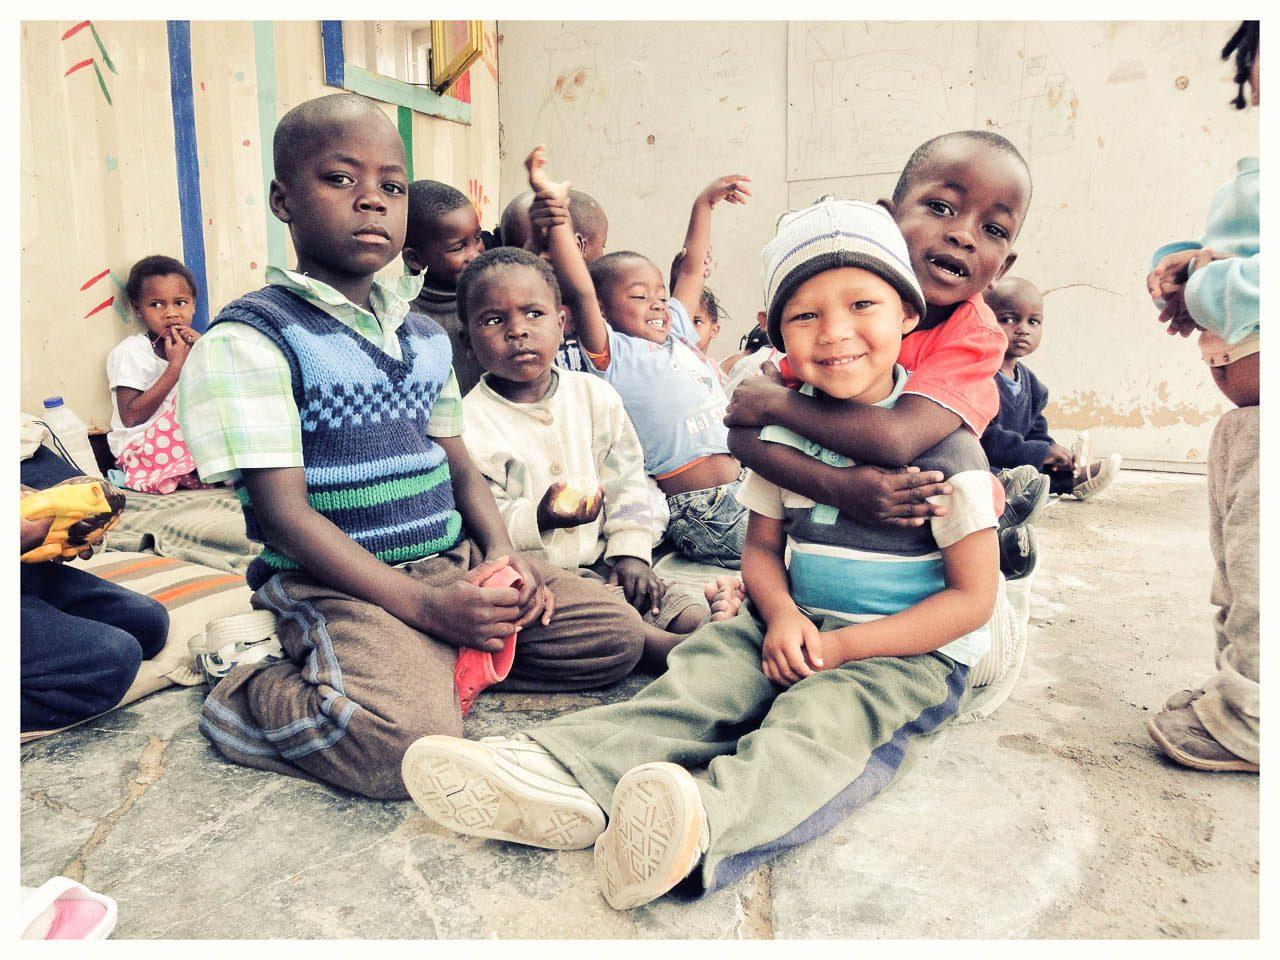 Fotodokumentation in Namibia/ Südafrika